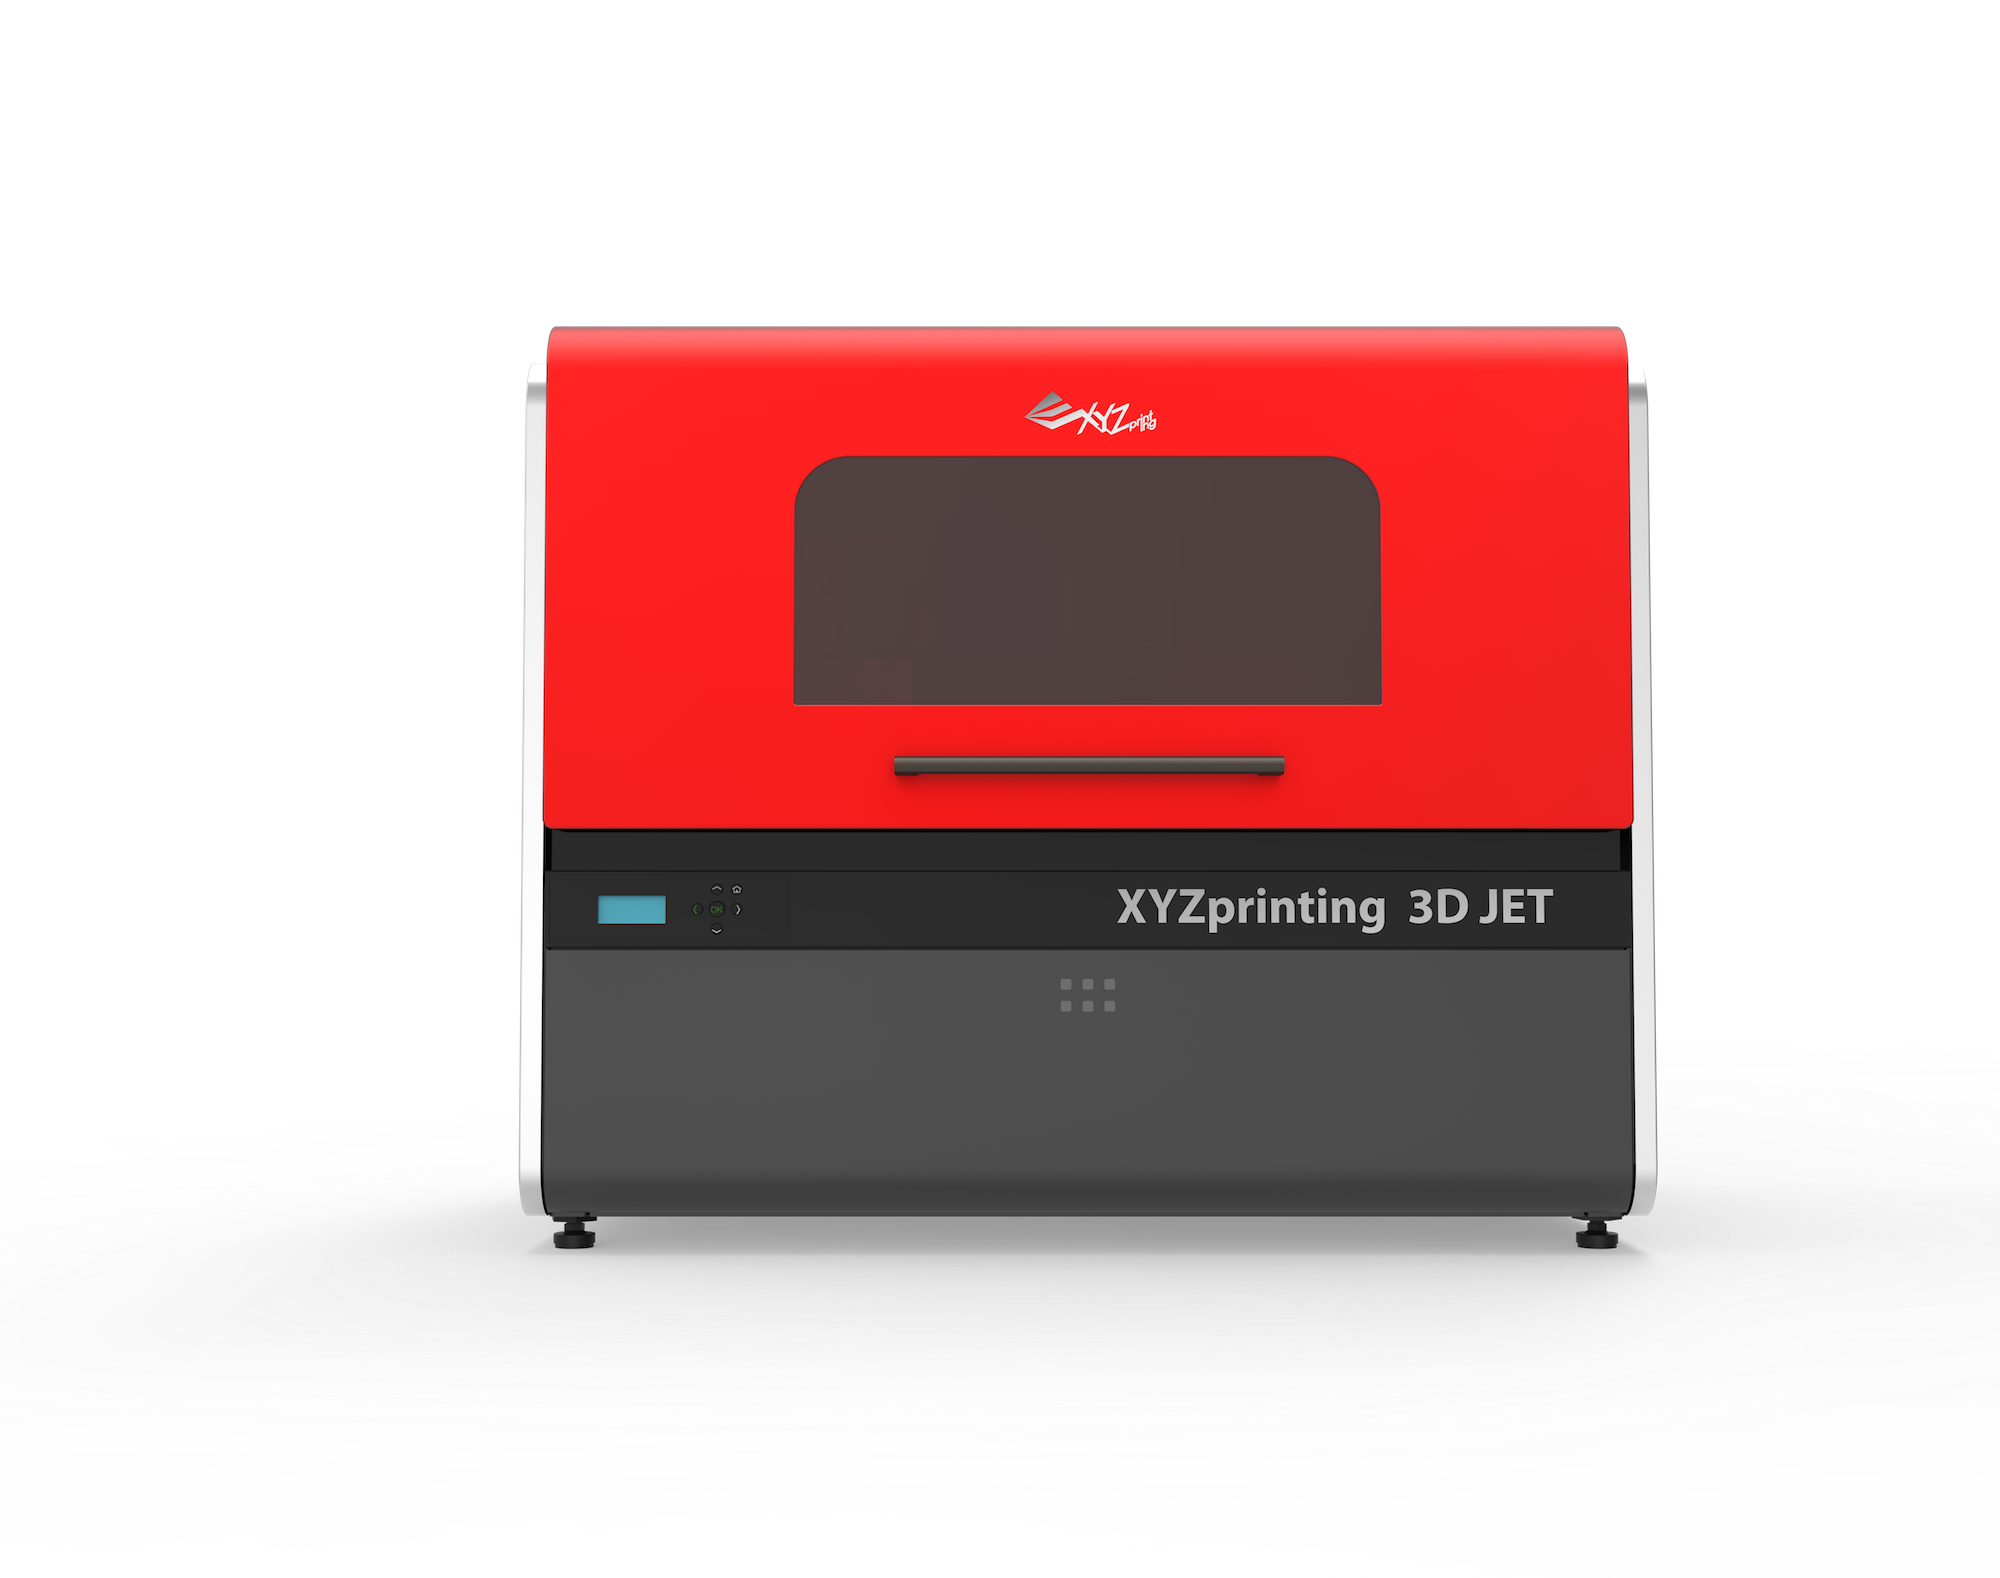 xyzprinting 3d jet - XYZprinting präsentiert neue 3D-Drucker auf CES 2017 - Update